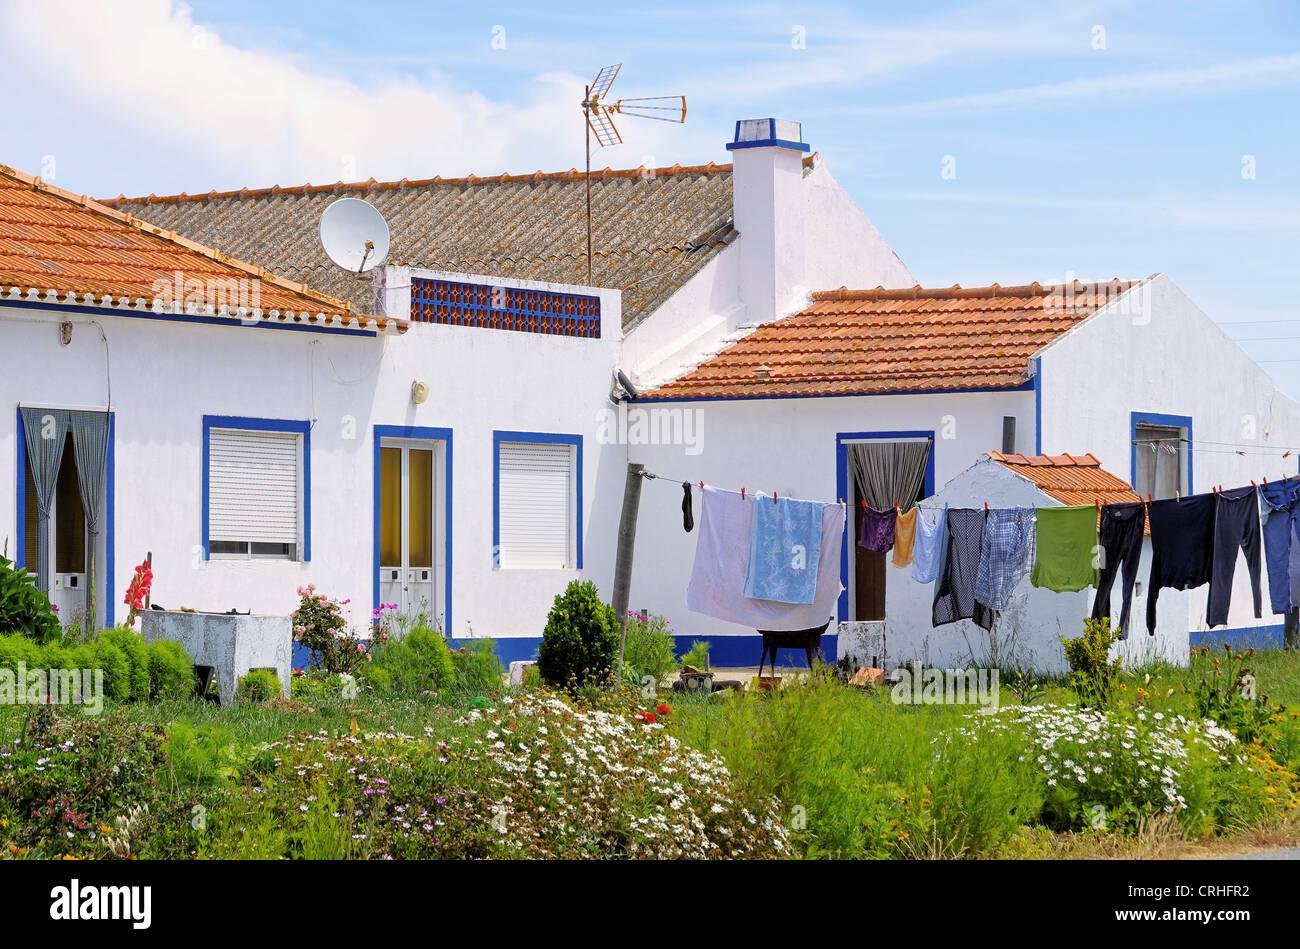 Portugal Haus - Portugal Haus 01 Stockbild